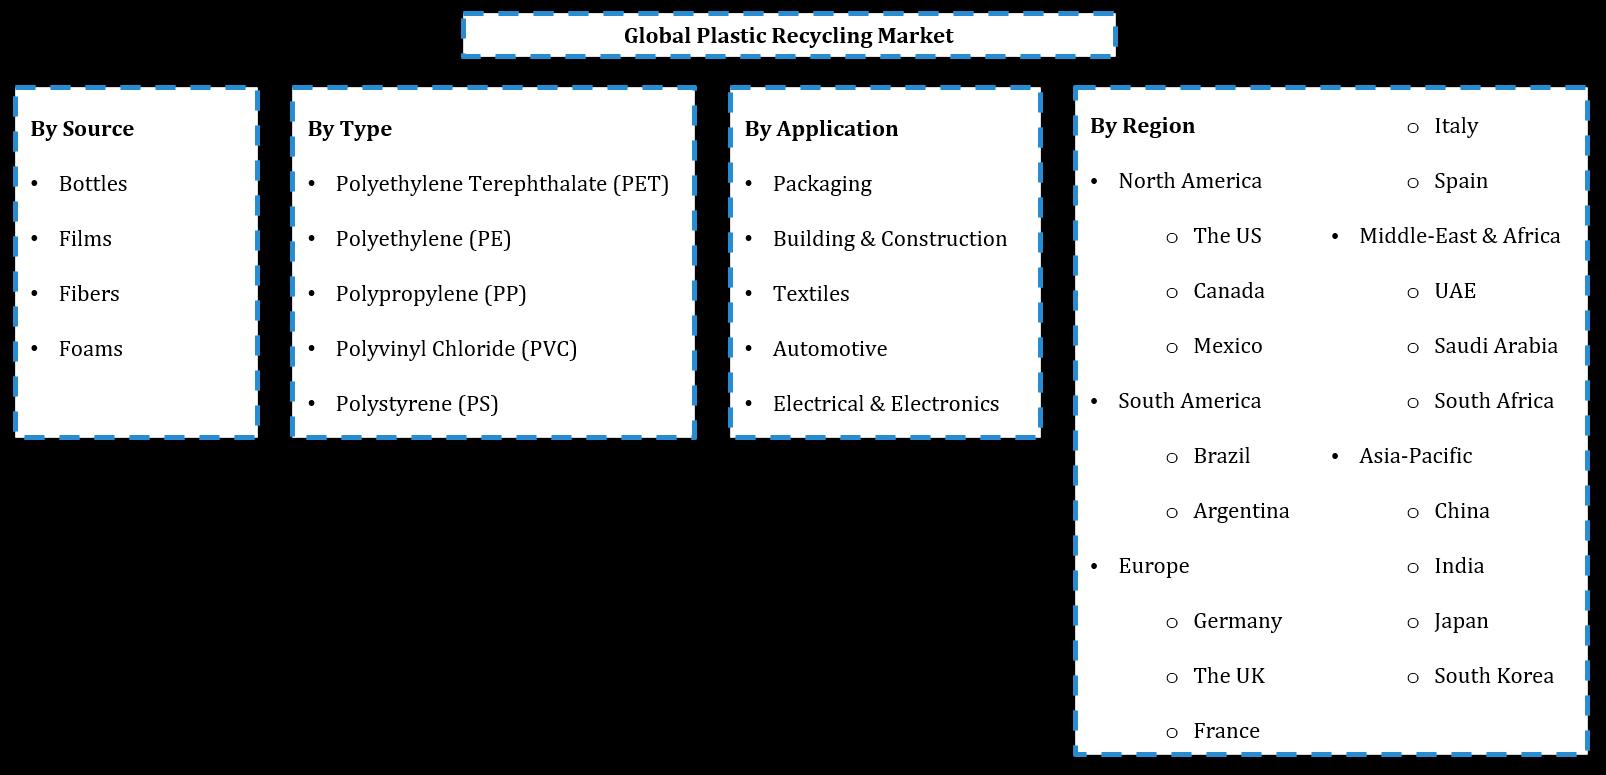 Global Plastic Recycling Market Segmentation